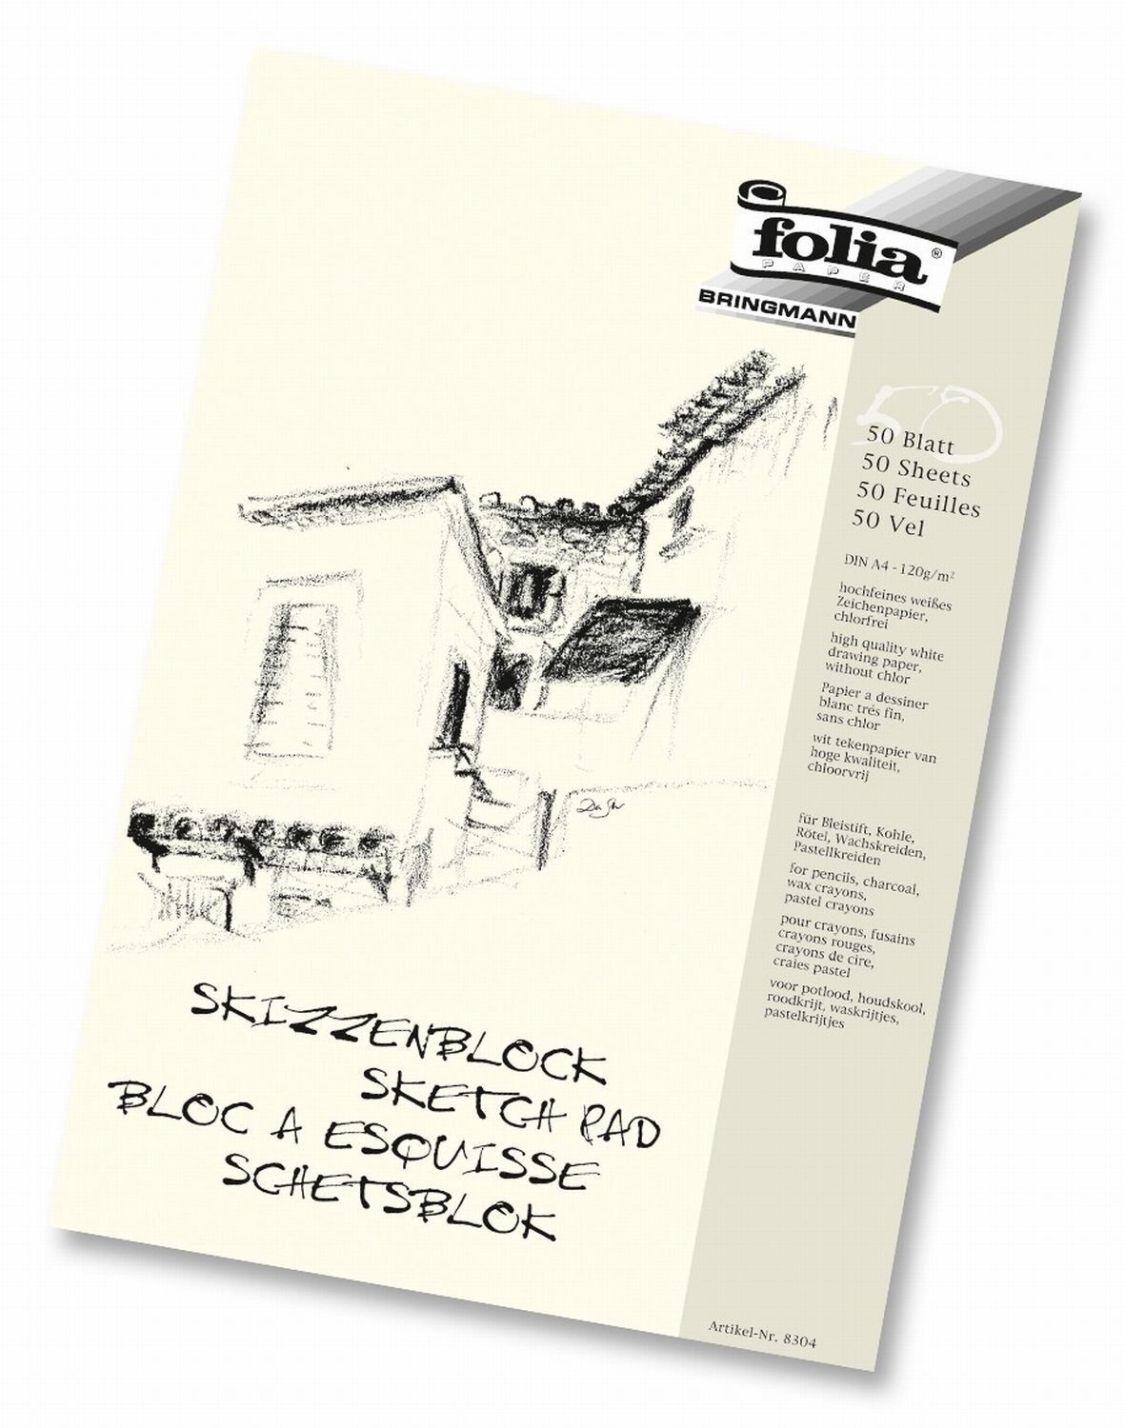 Folia Skizzenblock Zeichenblock Zeichenpapier DIN-A4 120g/m² 50 Blatt hochfein